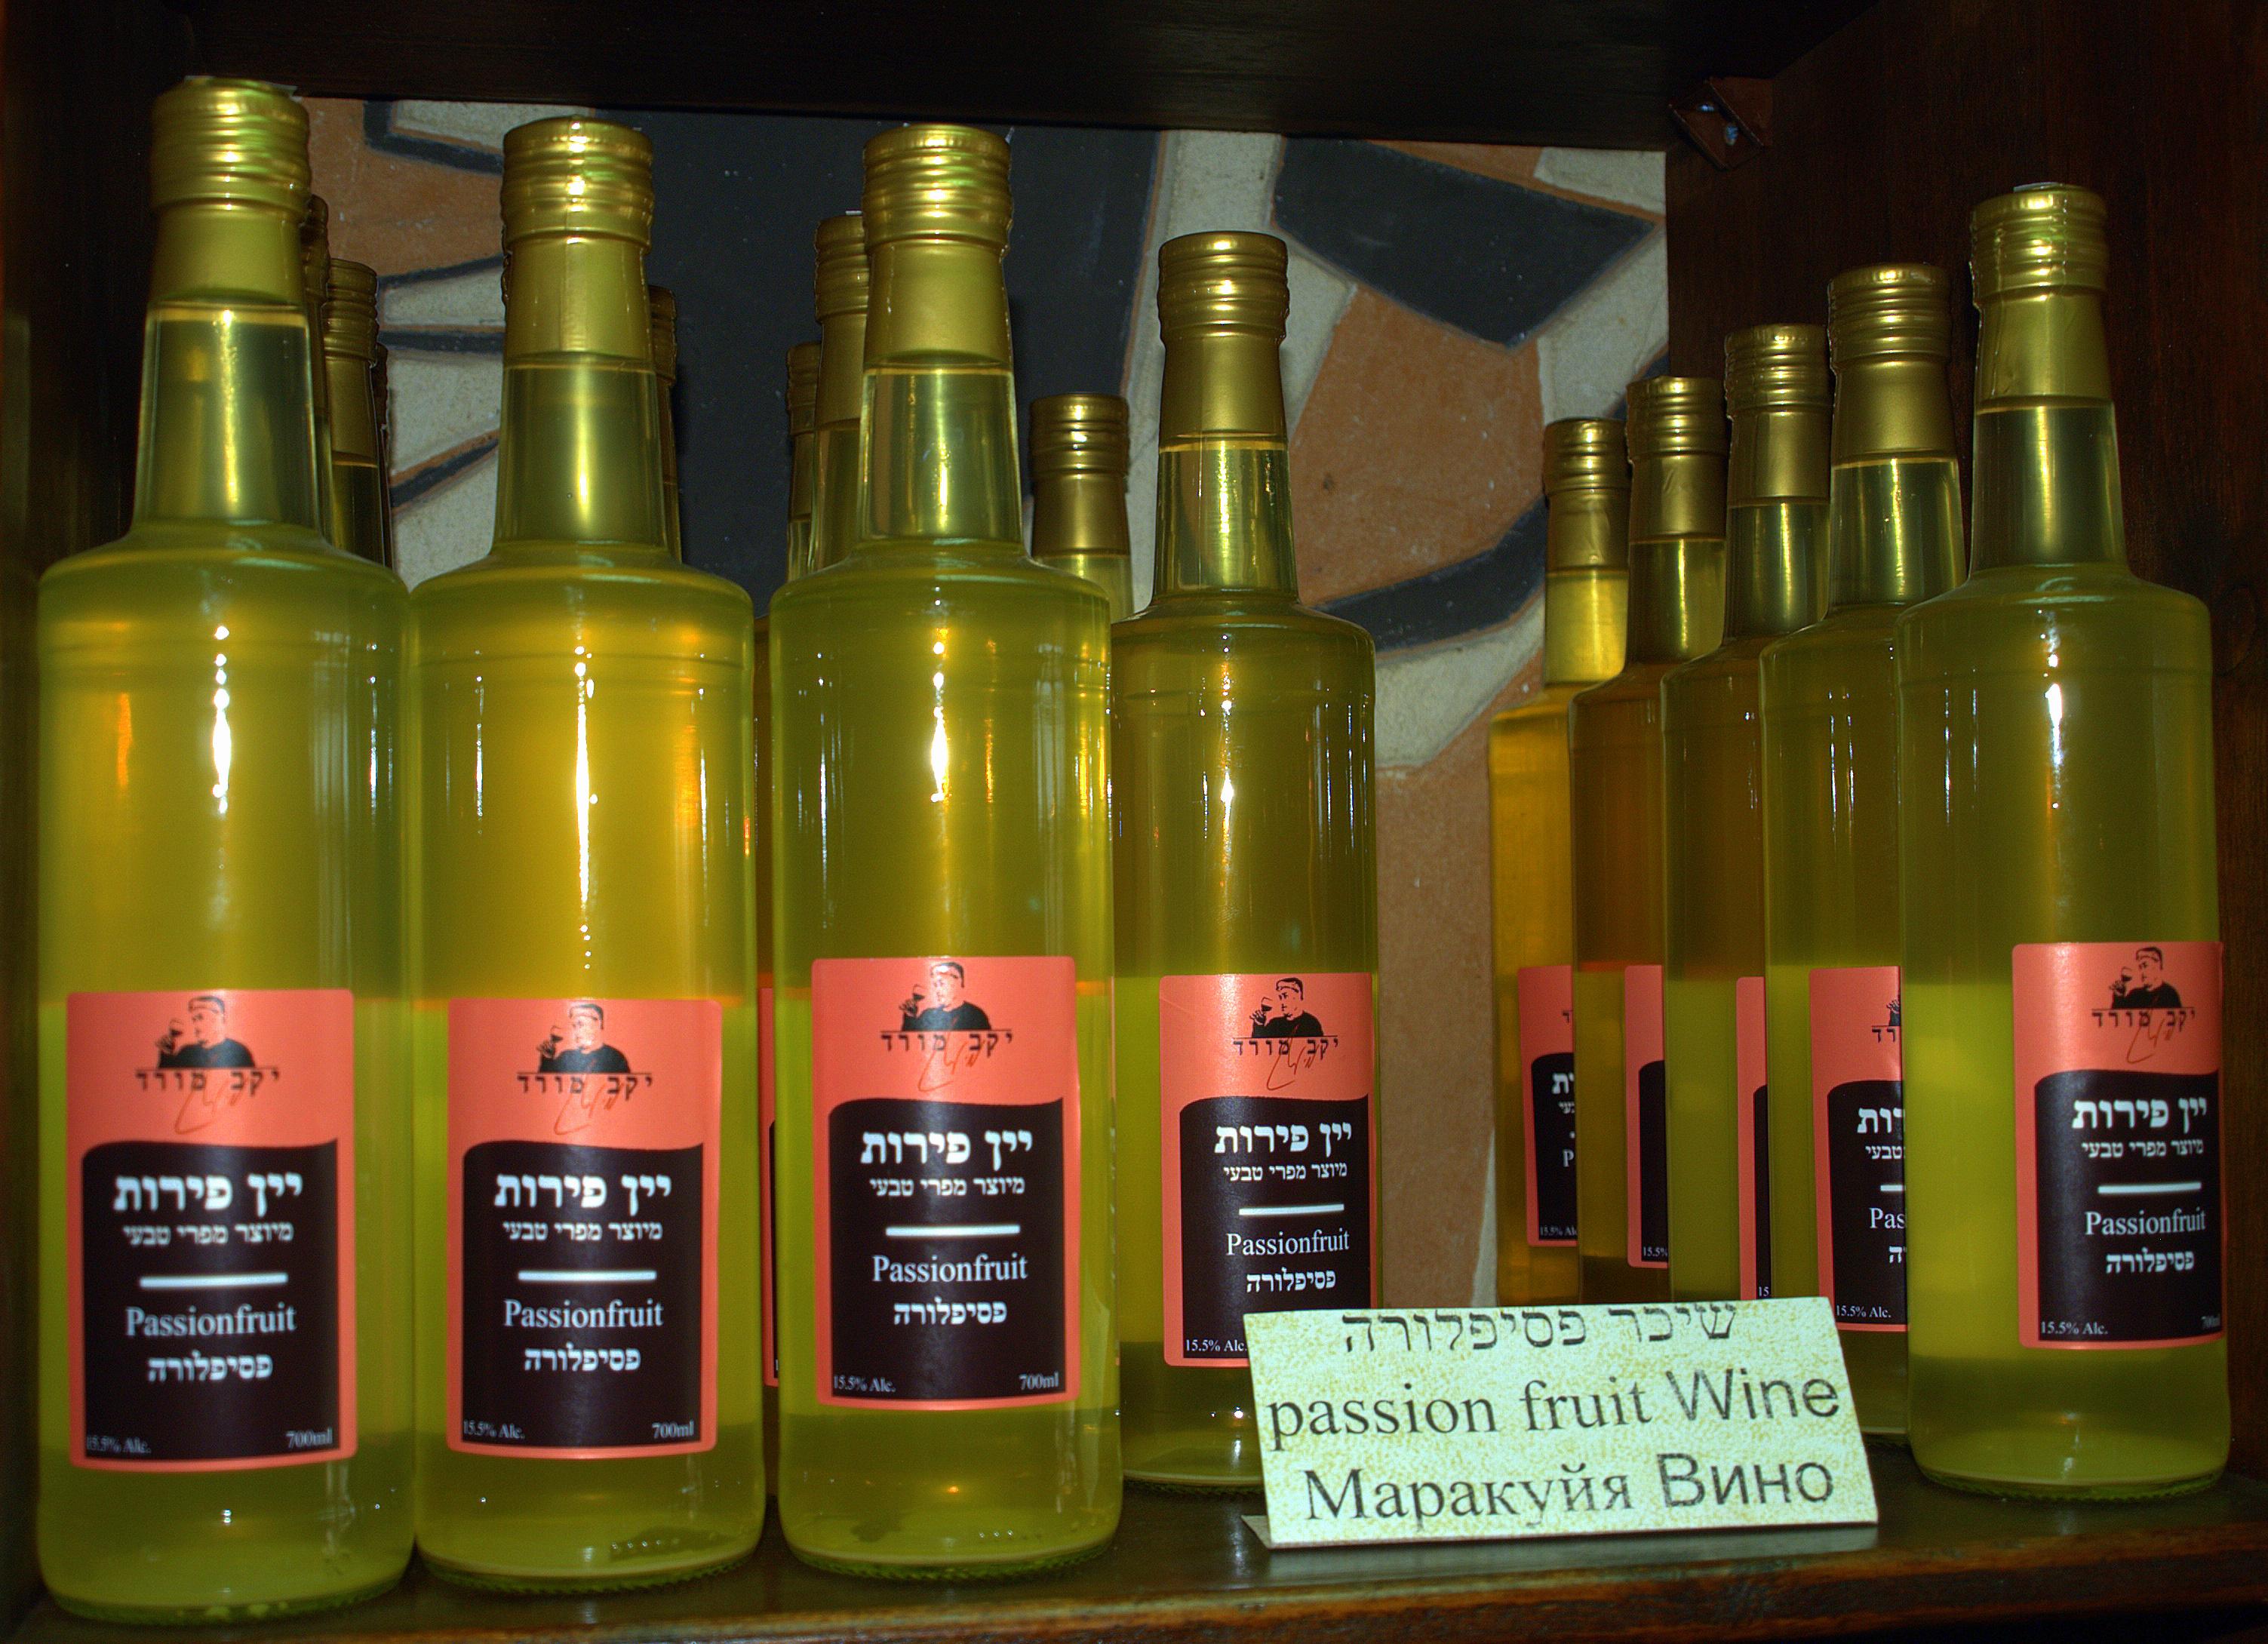 Filepassion Fruit Wine At Morad Winery In Israeljpg Wikimedia